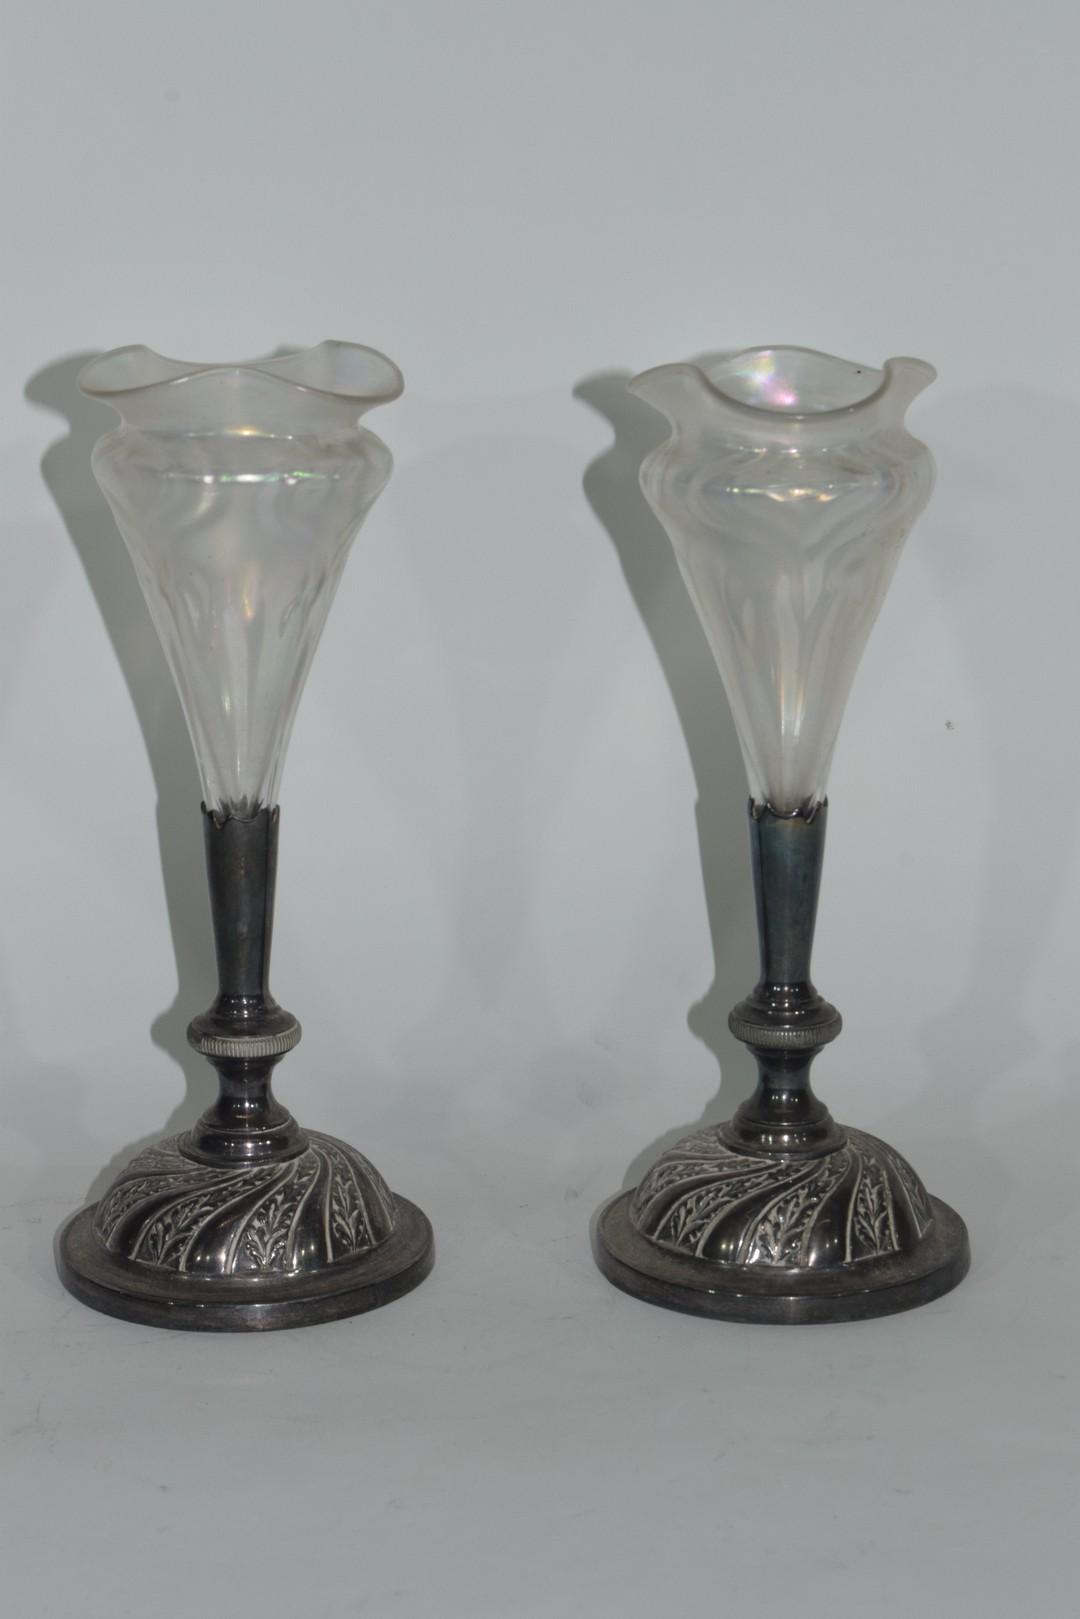 Pair of Art Nouveau bud vases - Image 3 of 5